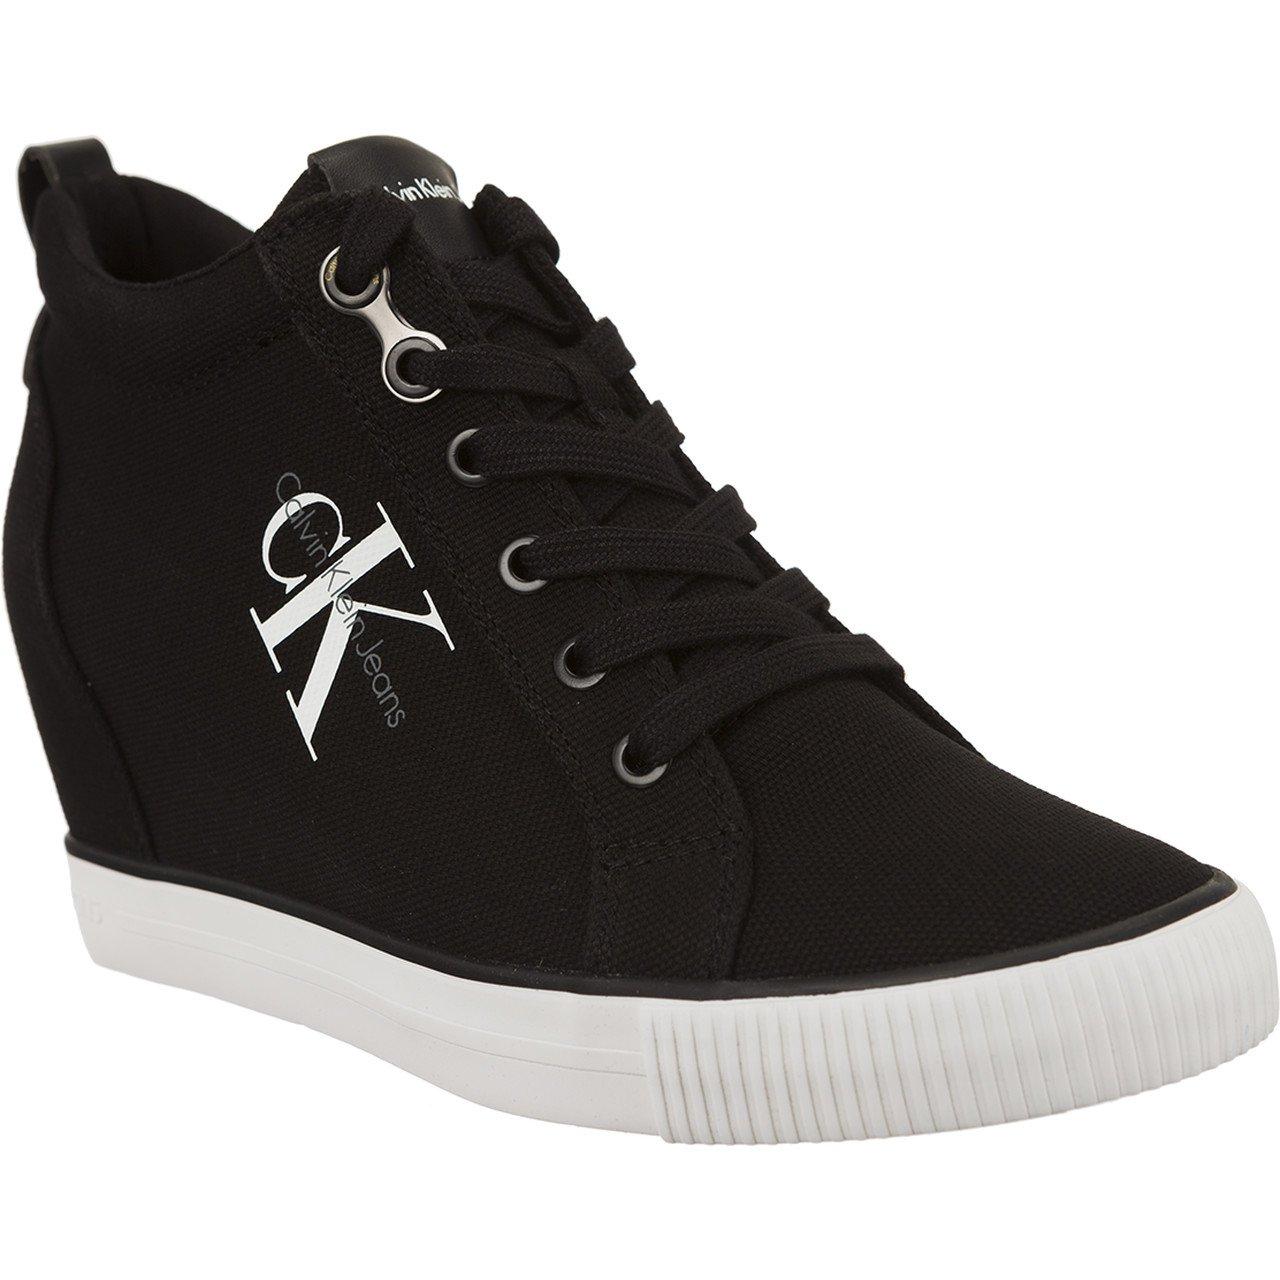 Calvin Klein Jeans Ritzy Nylon, Zapatillas Altas para Mujer 39 EU Negro (Black 000)